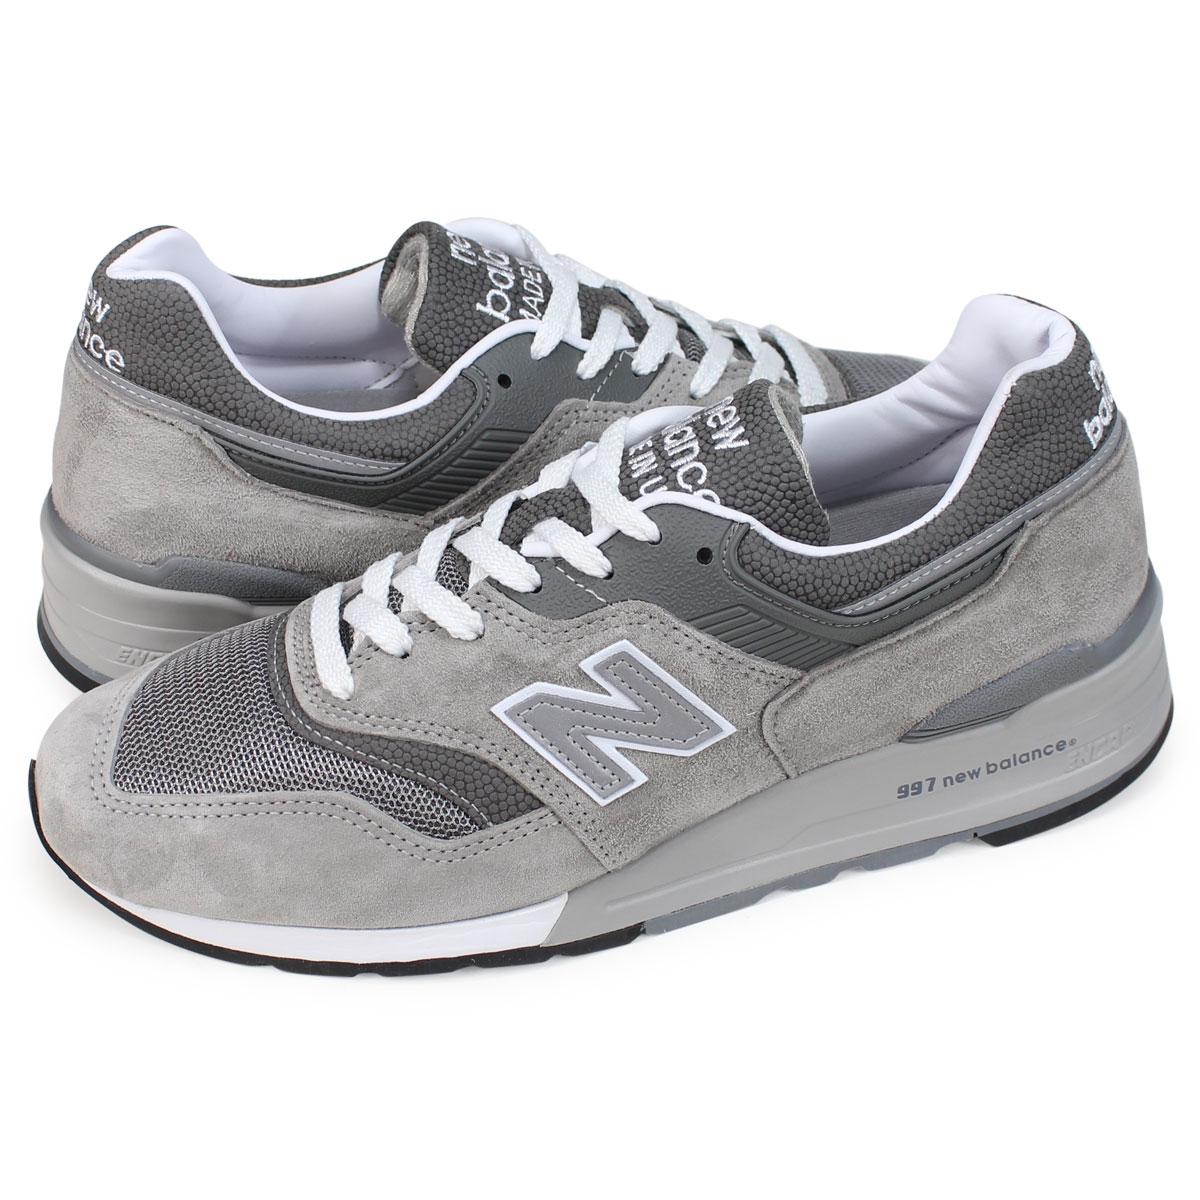 new balance 997 gray